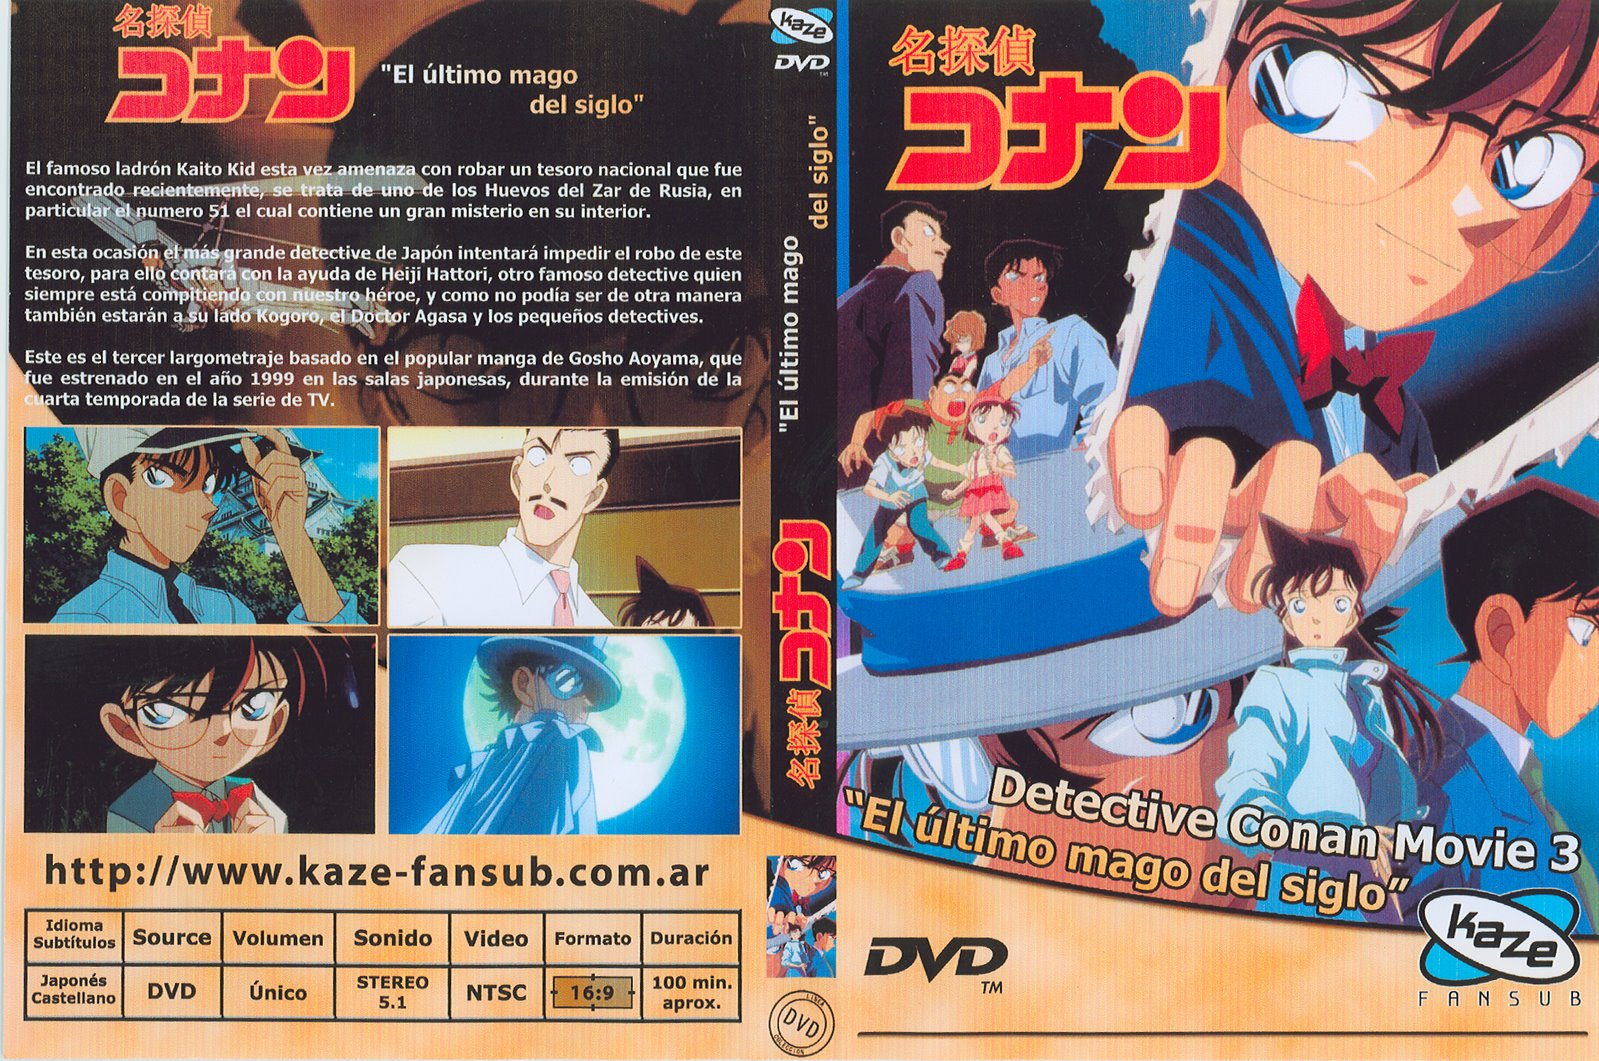 http://3.bp.blogspot.com/_K1_zrCfSEOw/R1DmWlkG_wI/AAAAAAAAAKs/-F8bDQYoeFU/s1600-R/Detective+Conan-El+Ultimo+Mago+del+Siglo%5BMovie+3%5D_front.jpg